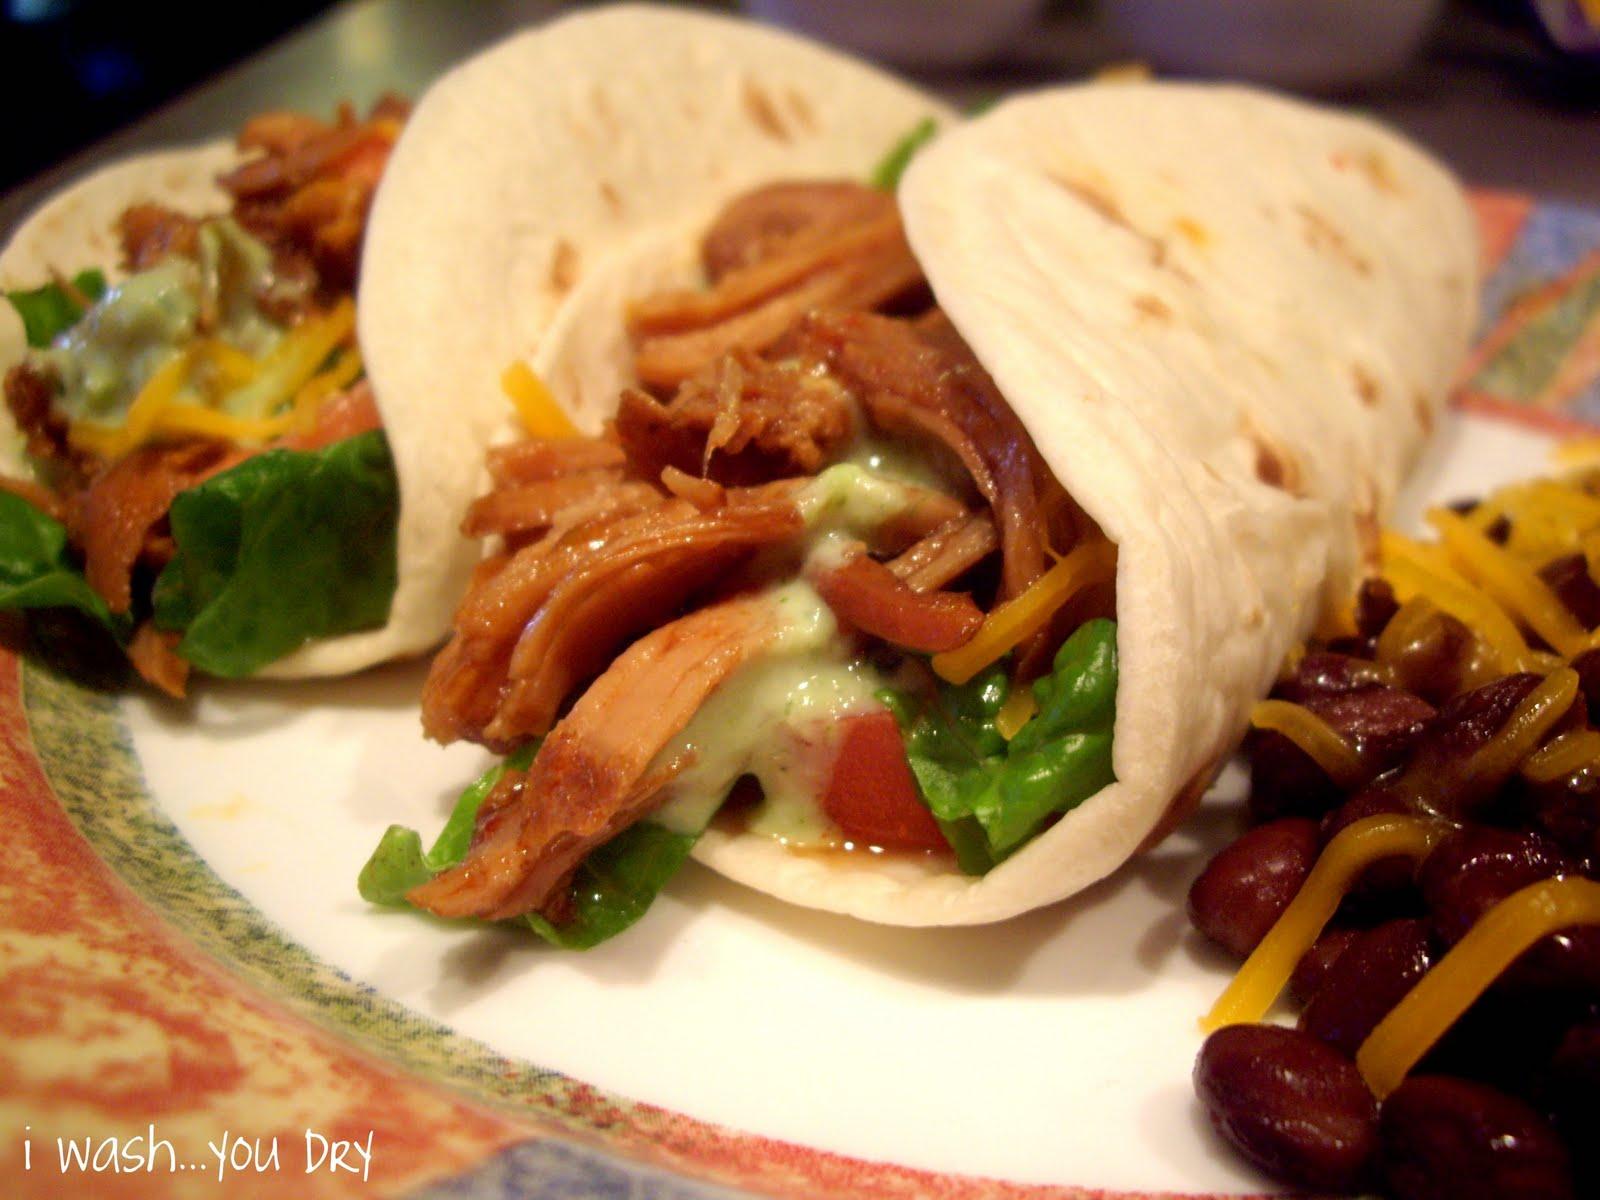 ... dry rub elk tacos blackened sirloin tacos tacos sirloin barbacoa tacos